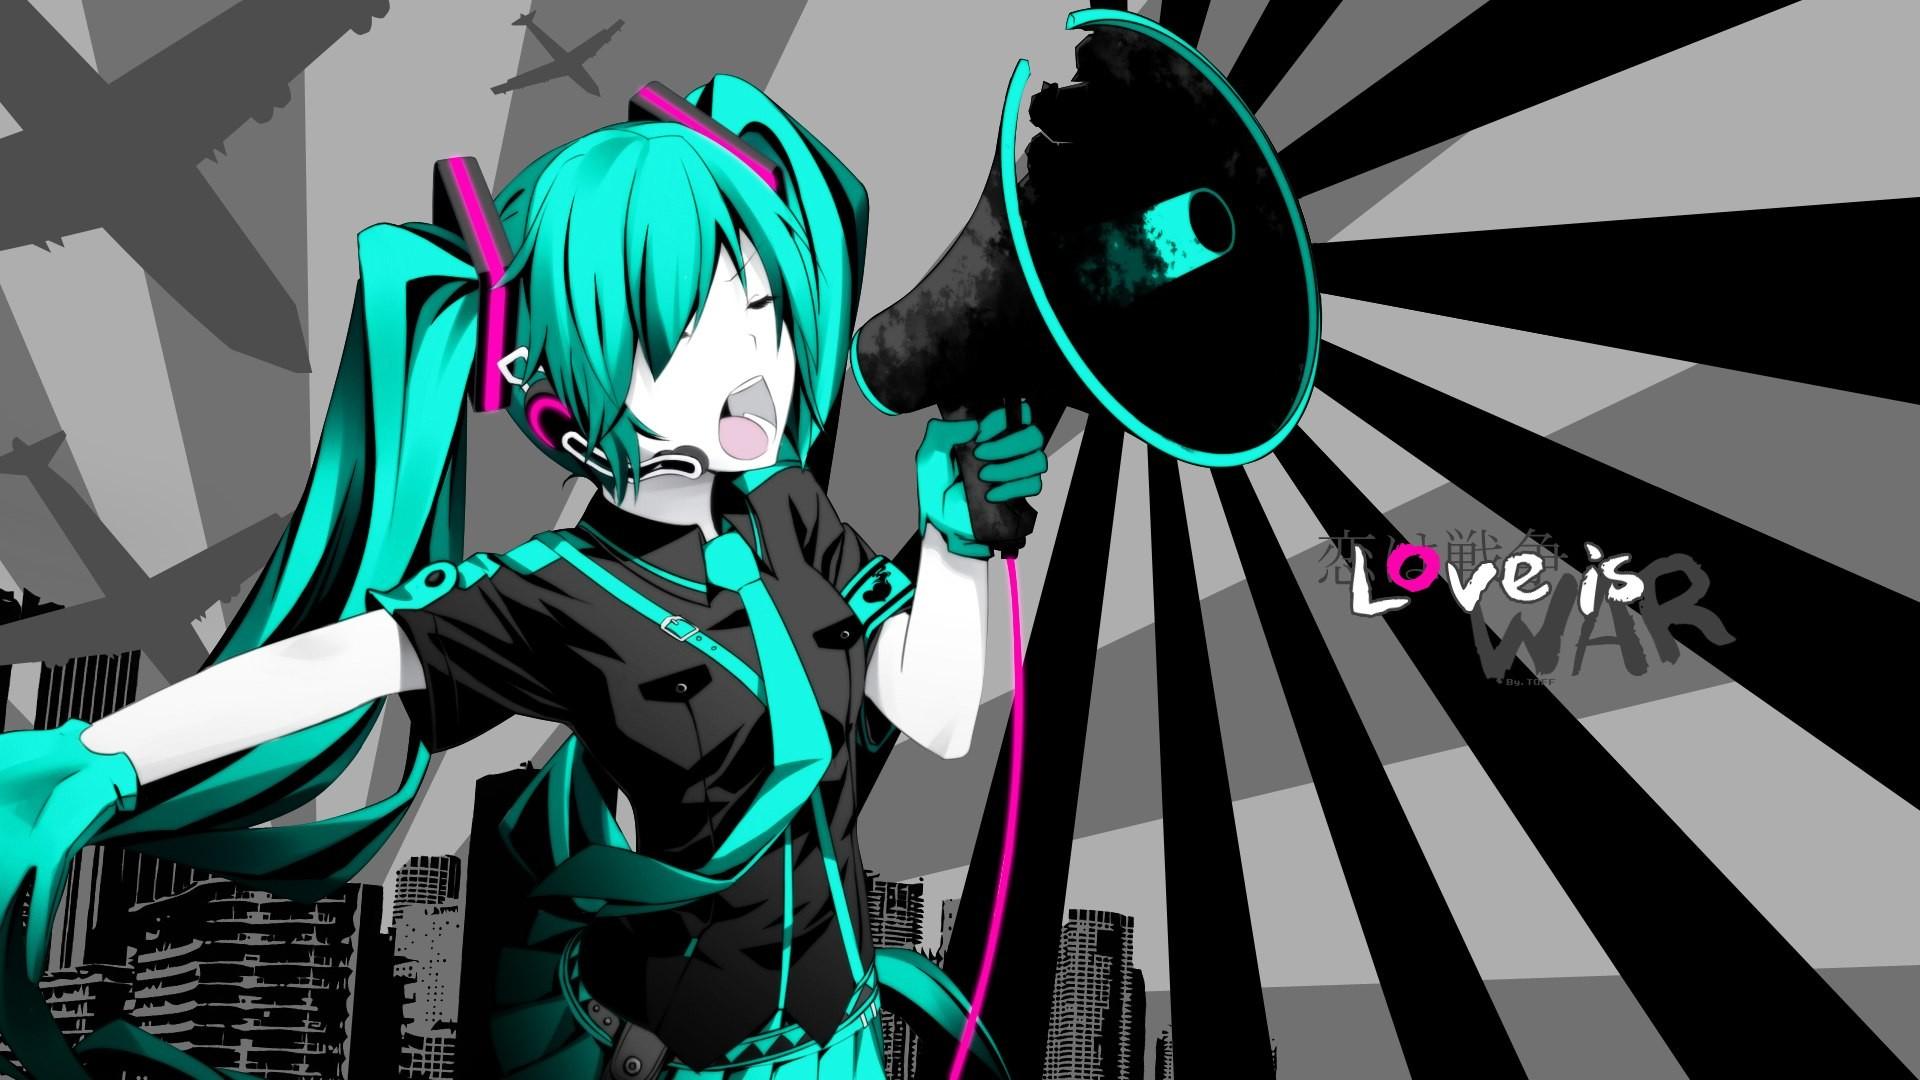 1920x1080 anime-dj-headphones-wallpaper-hd-desktop-10.jpg (